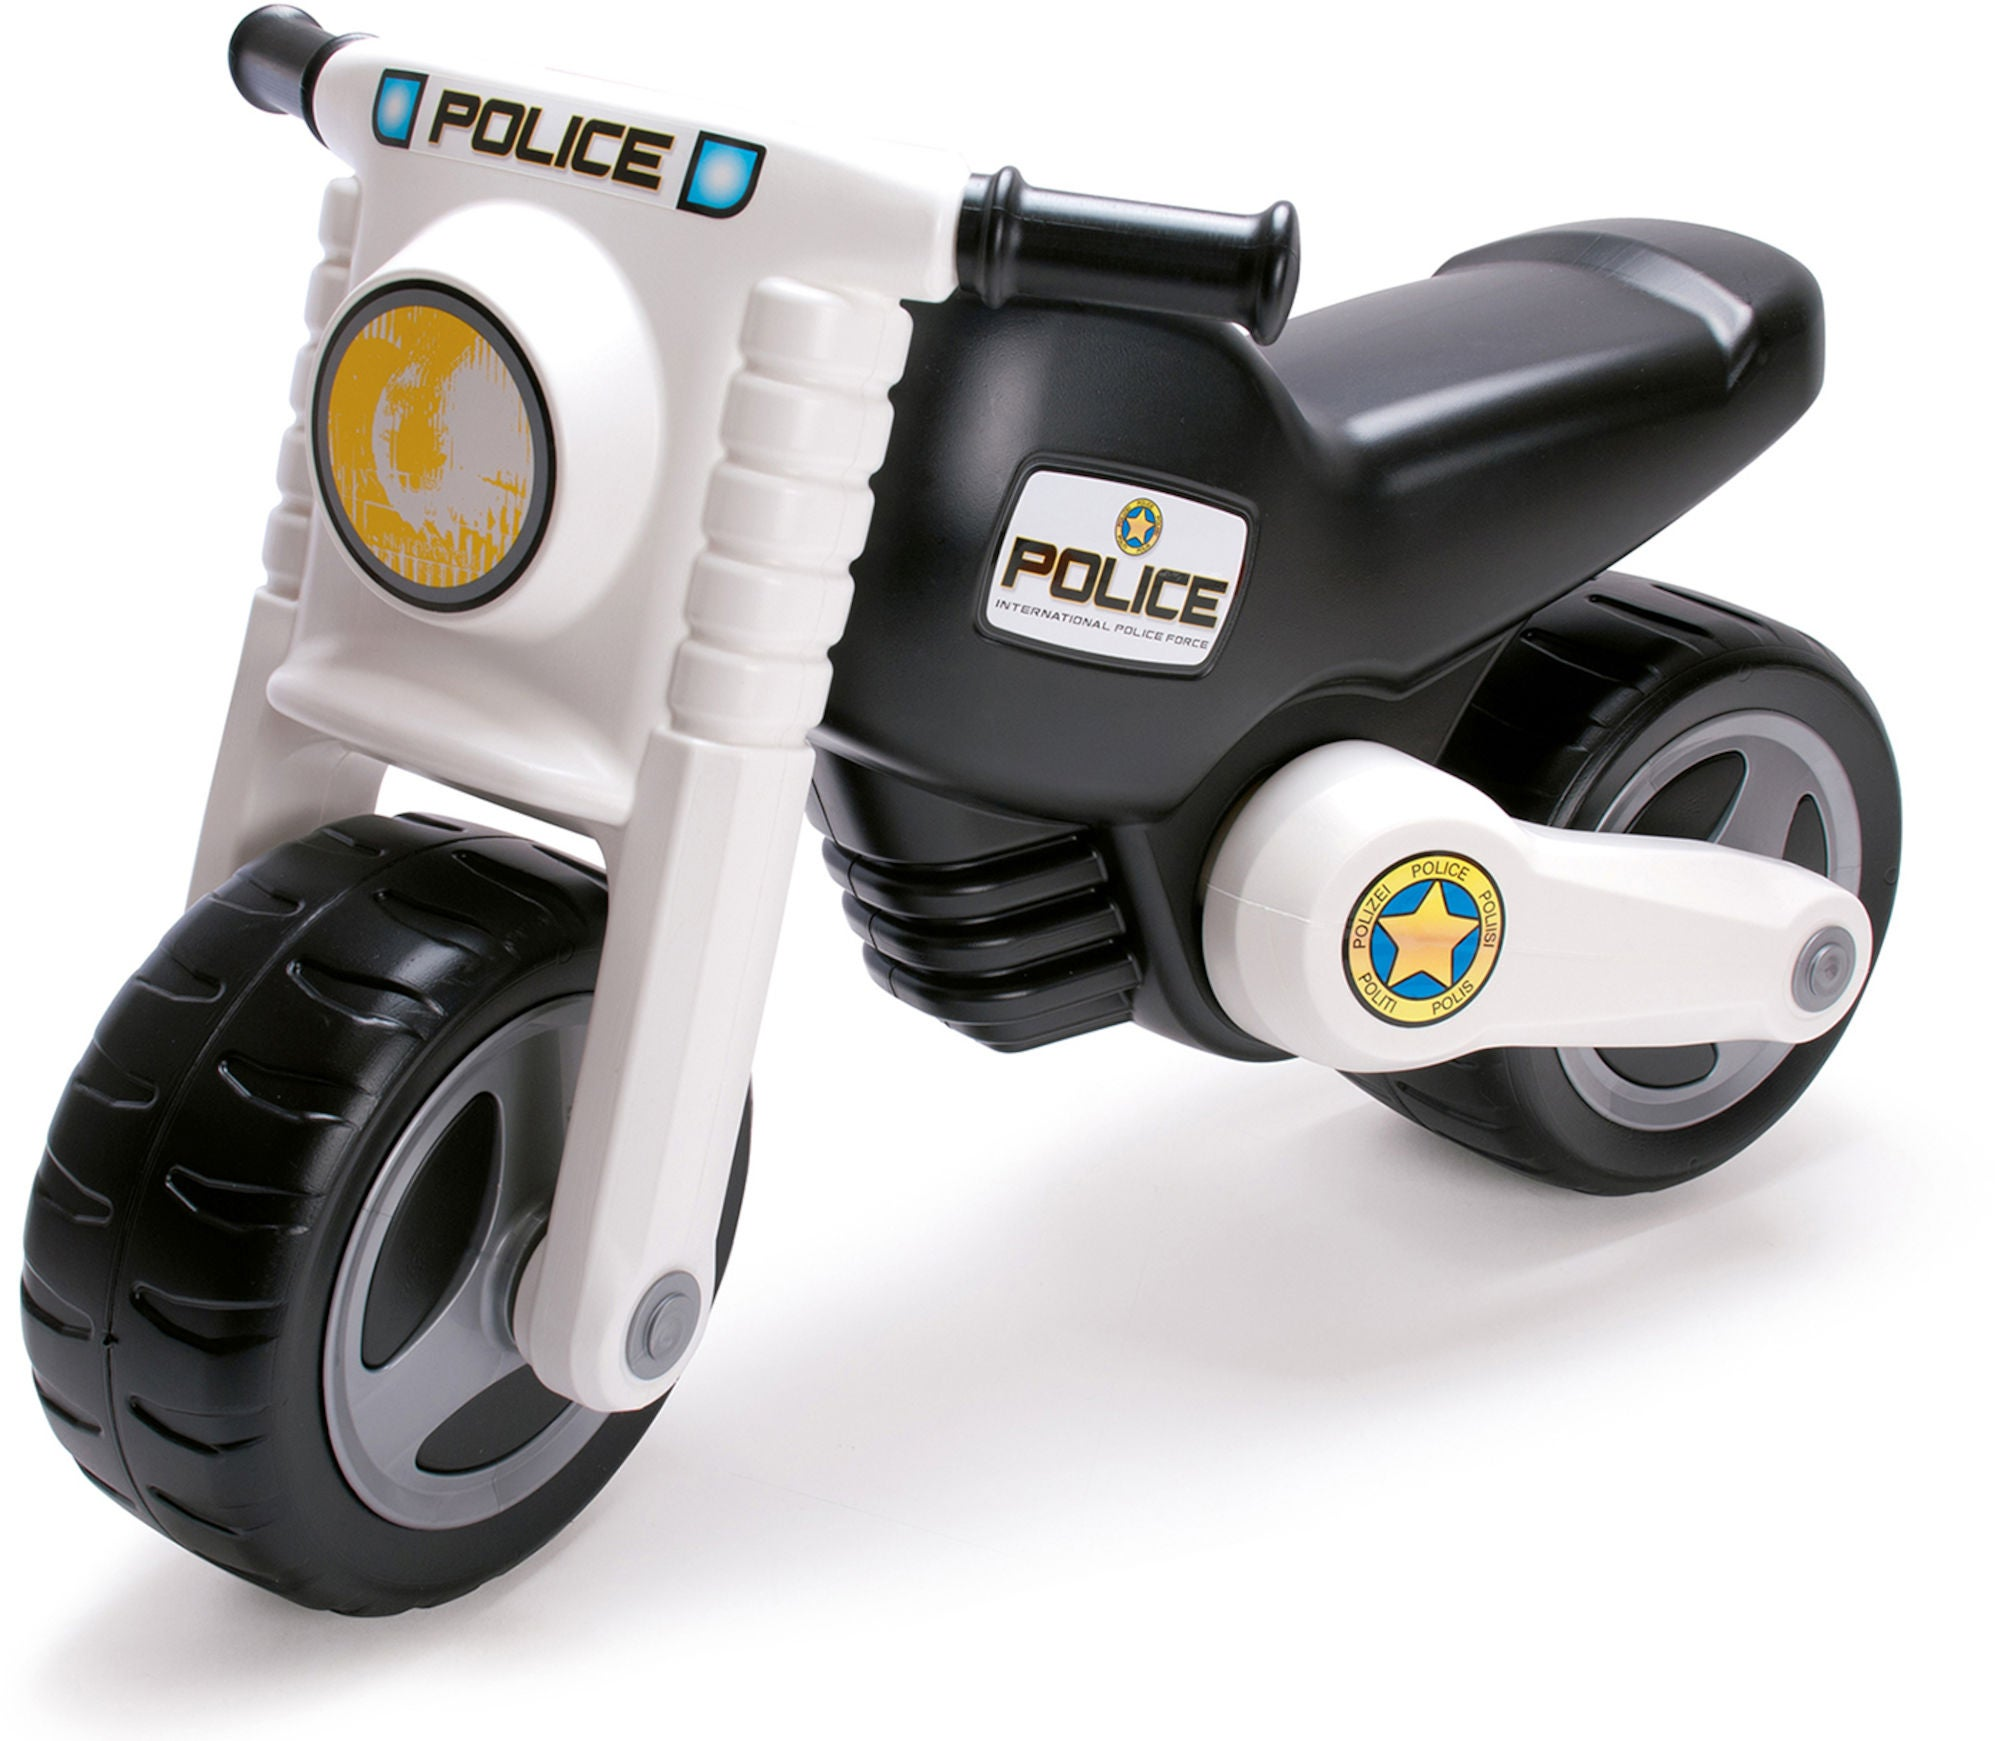 Dantoy Motorsykkel Politi, Svart/Hvit